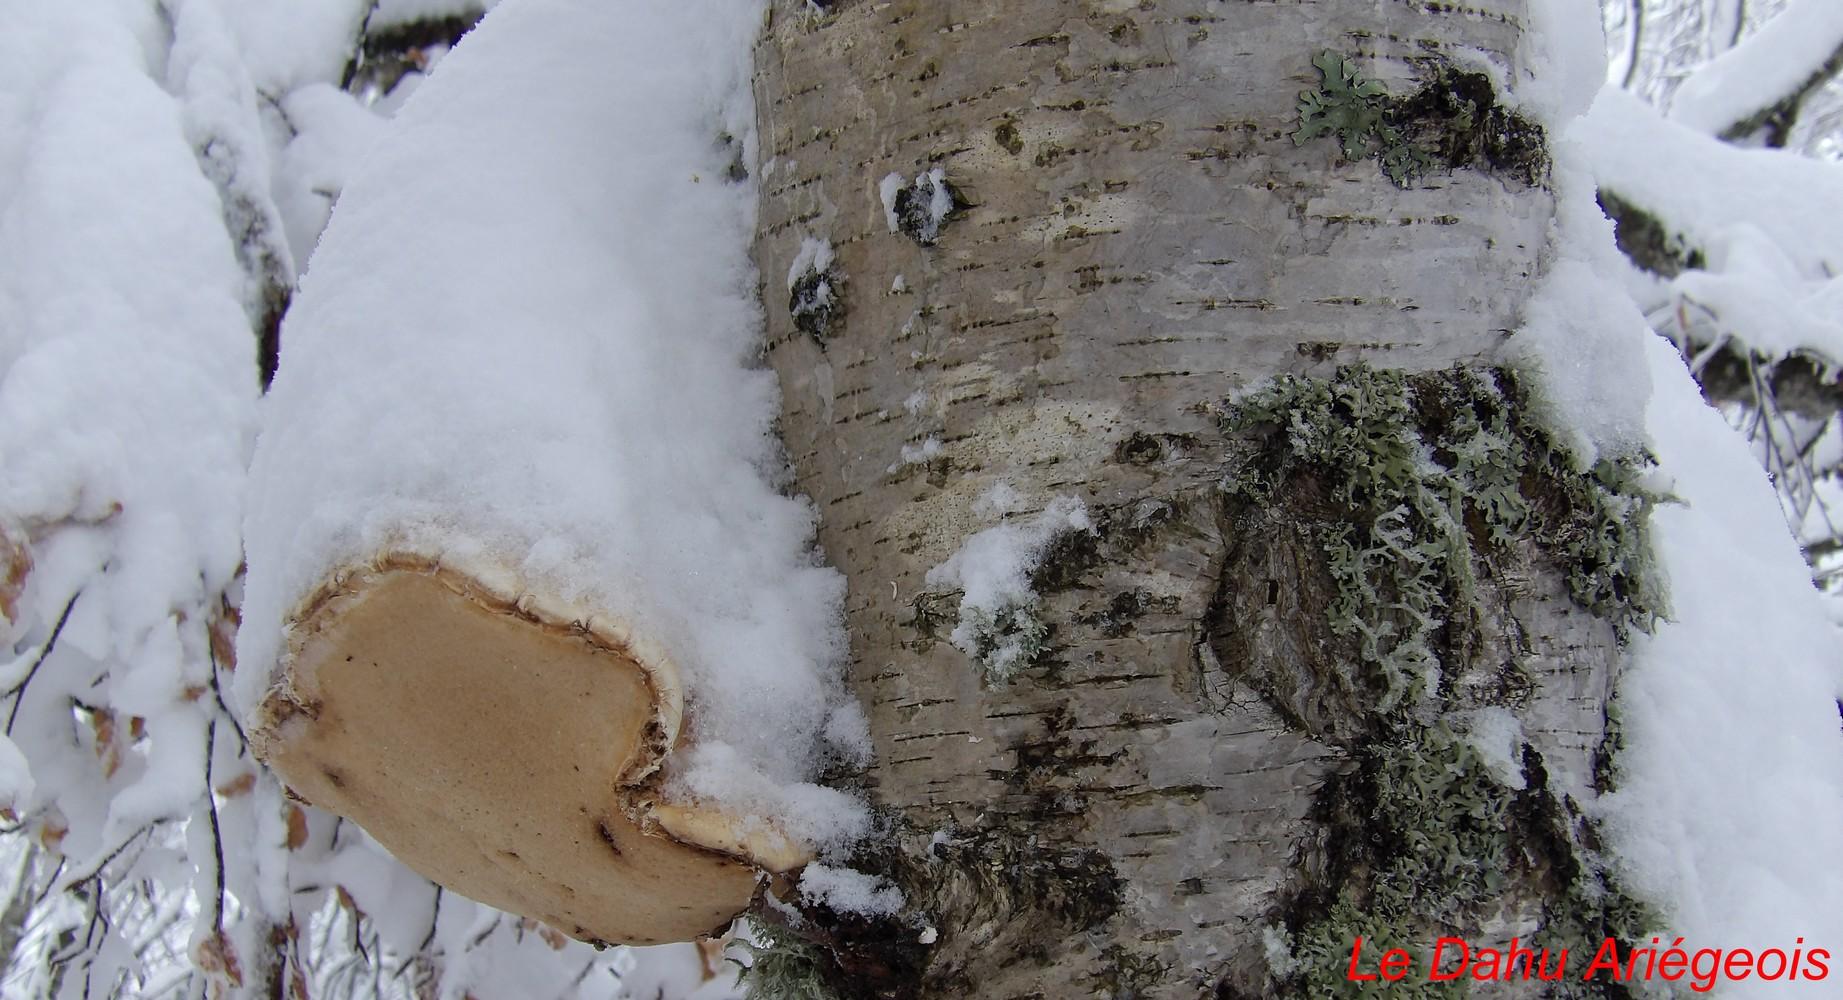 Raquettes a neige - Paysage Ariege 4